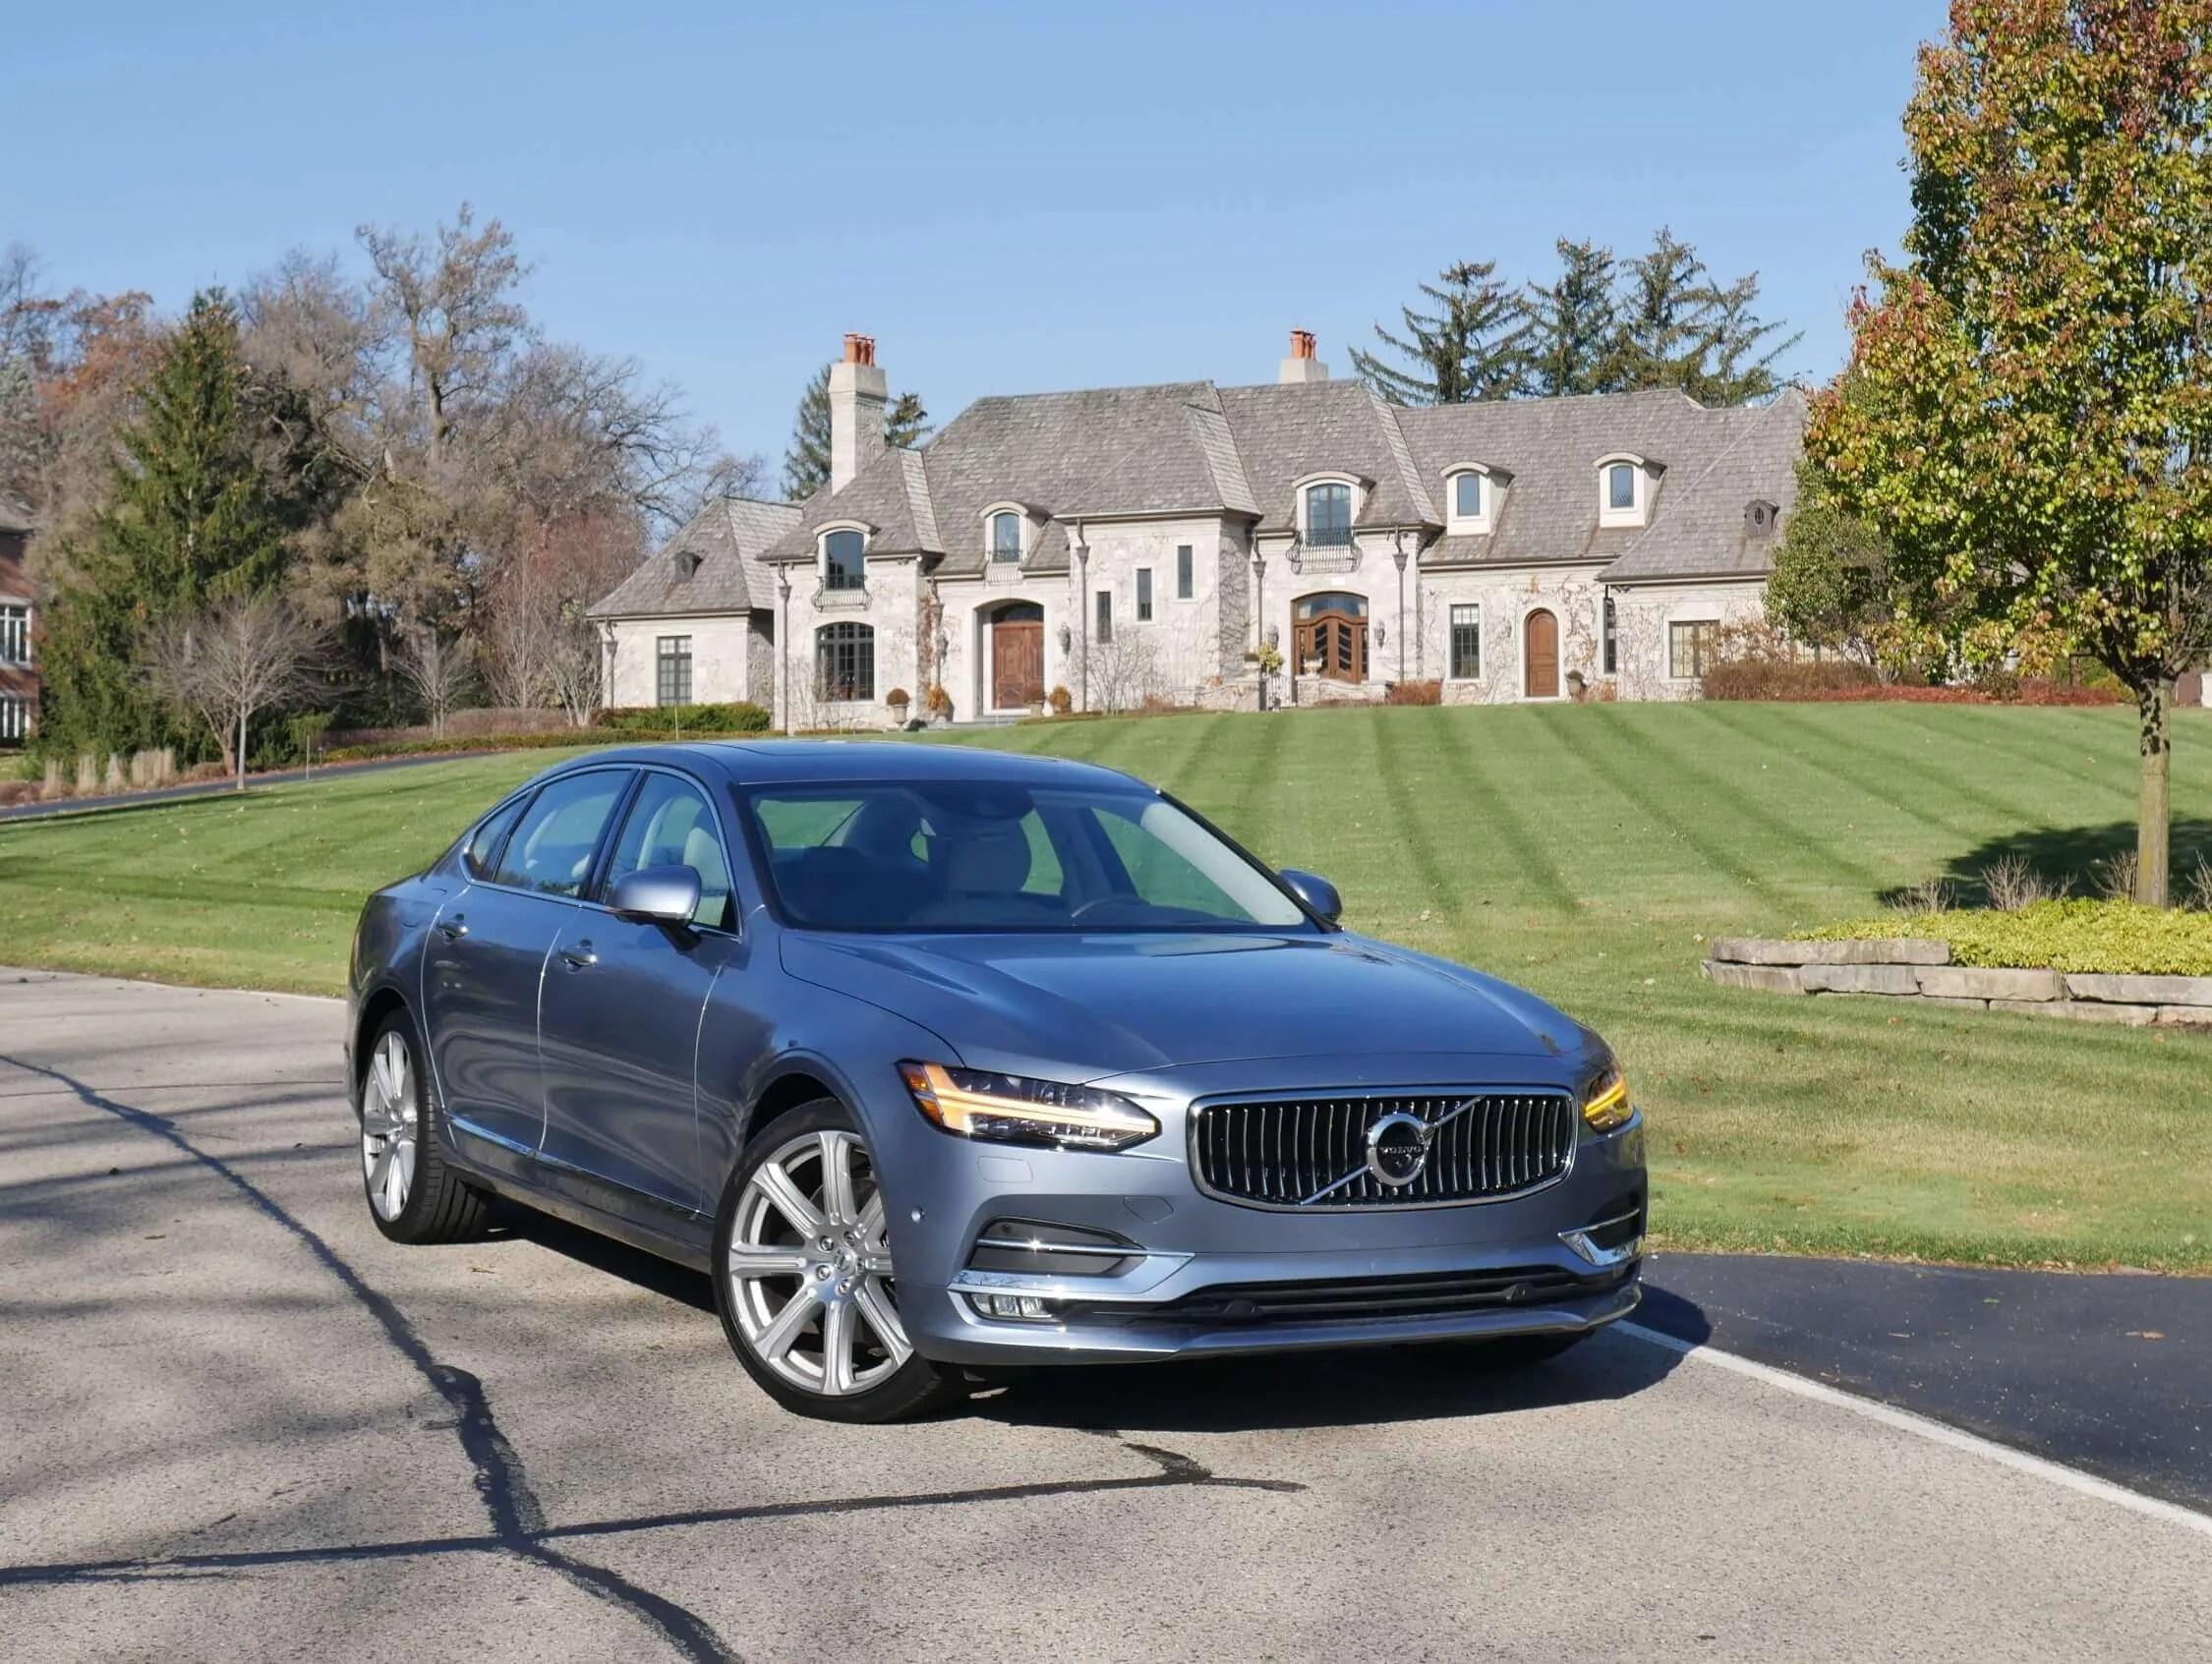 2018 Volvo S90 T6 Inscription Awd Bottom Line Review Roadblazing